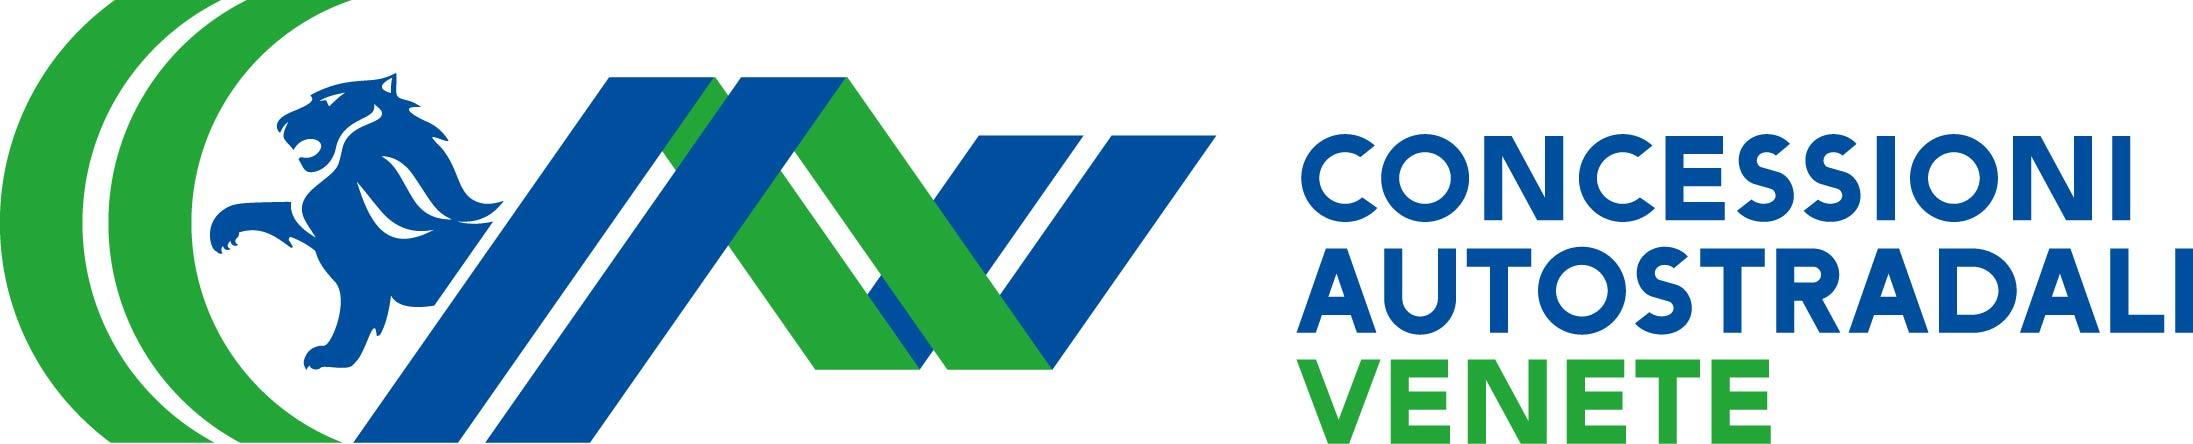 Concessioni Autostradali Venete Logo